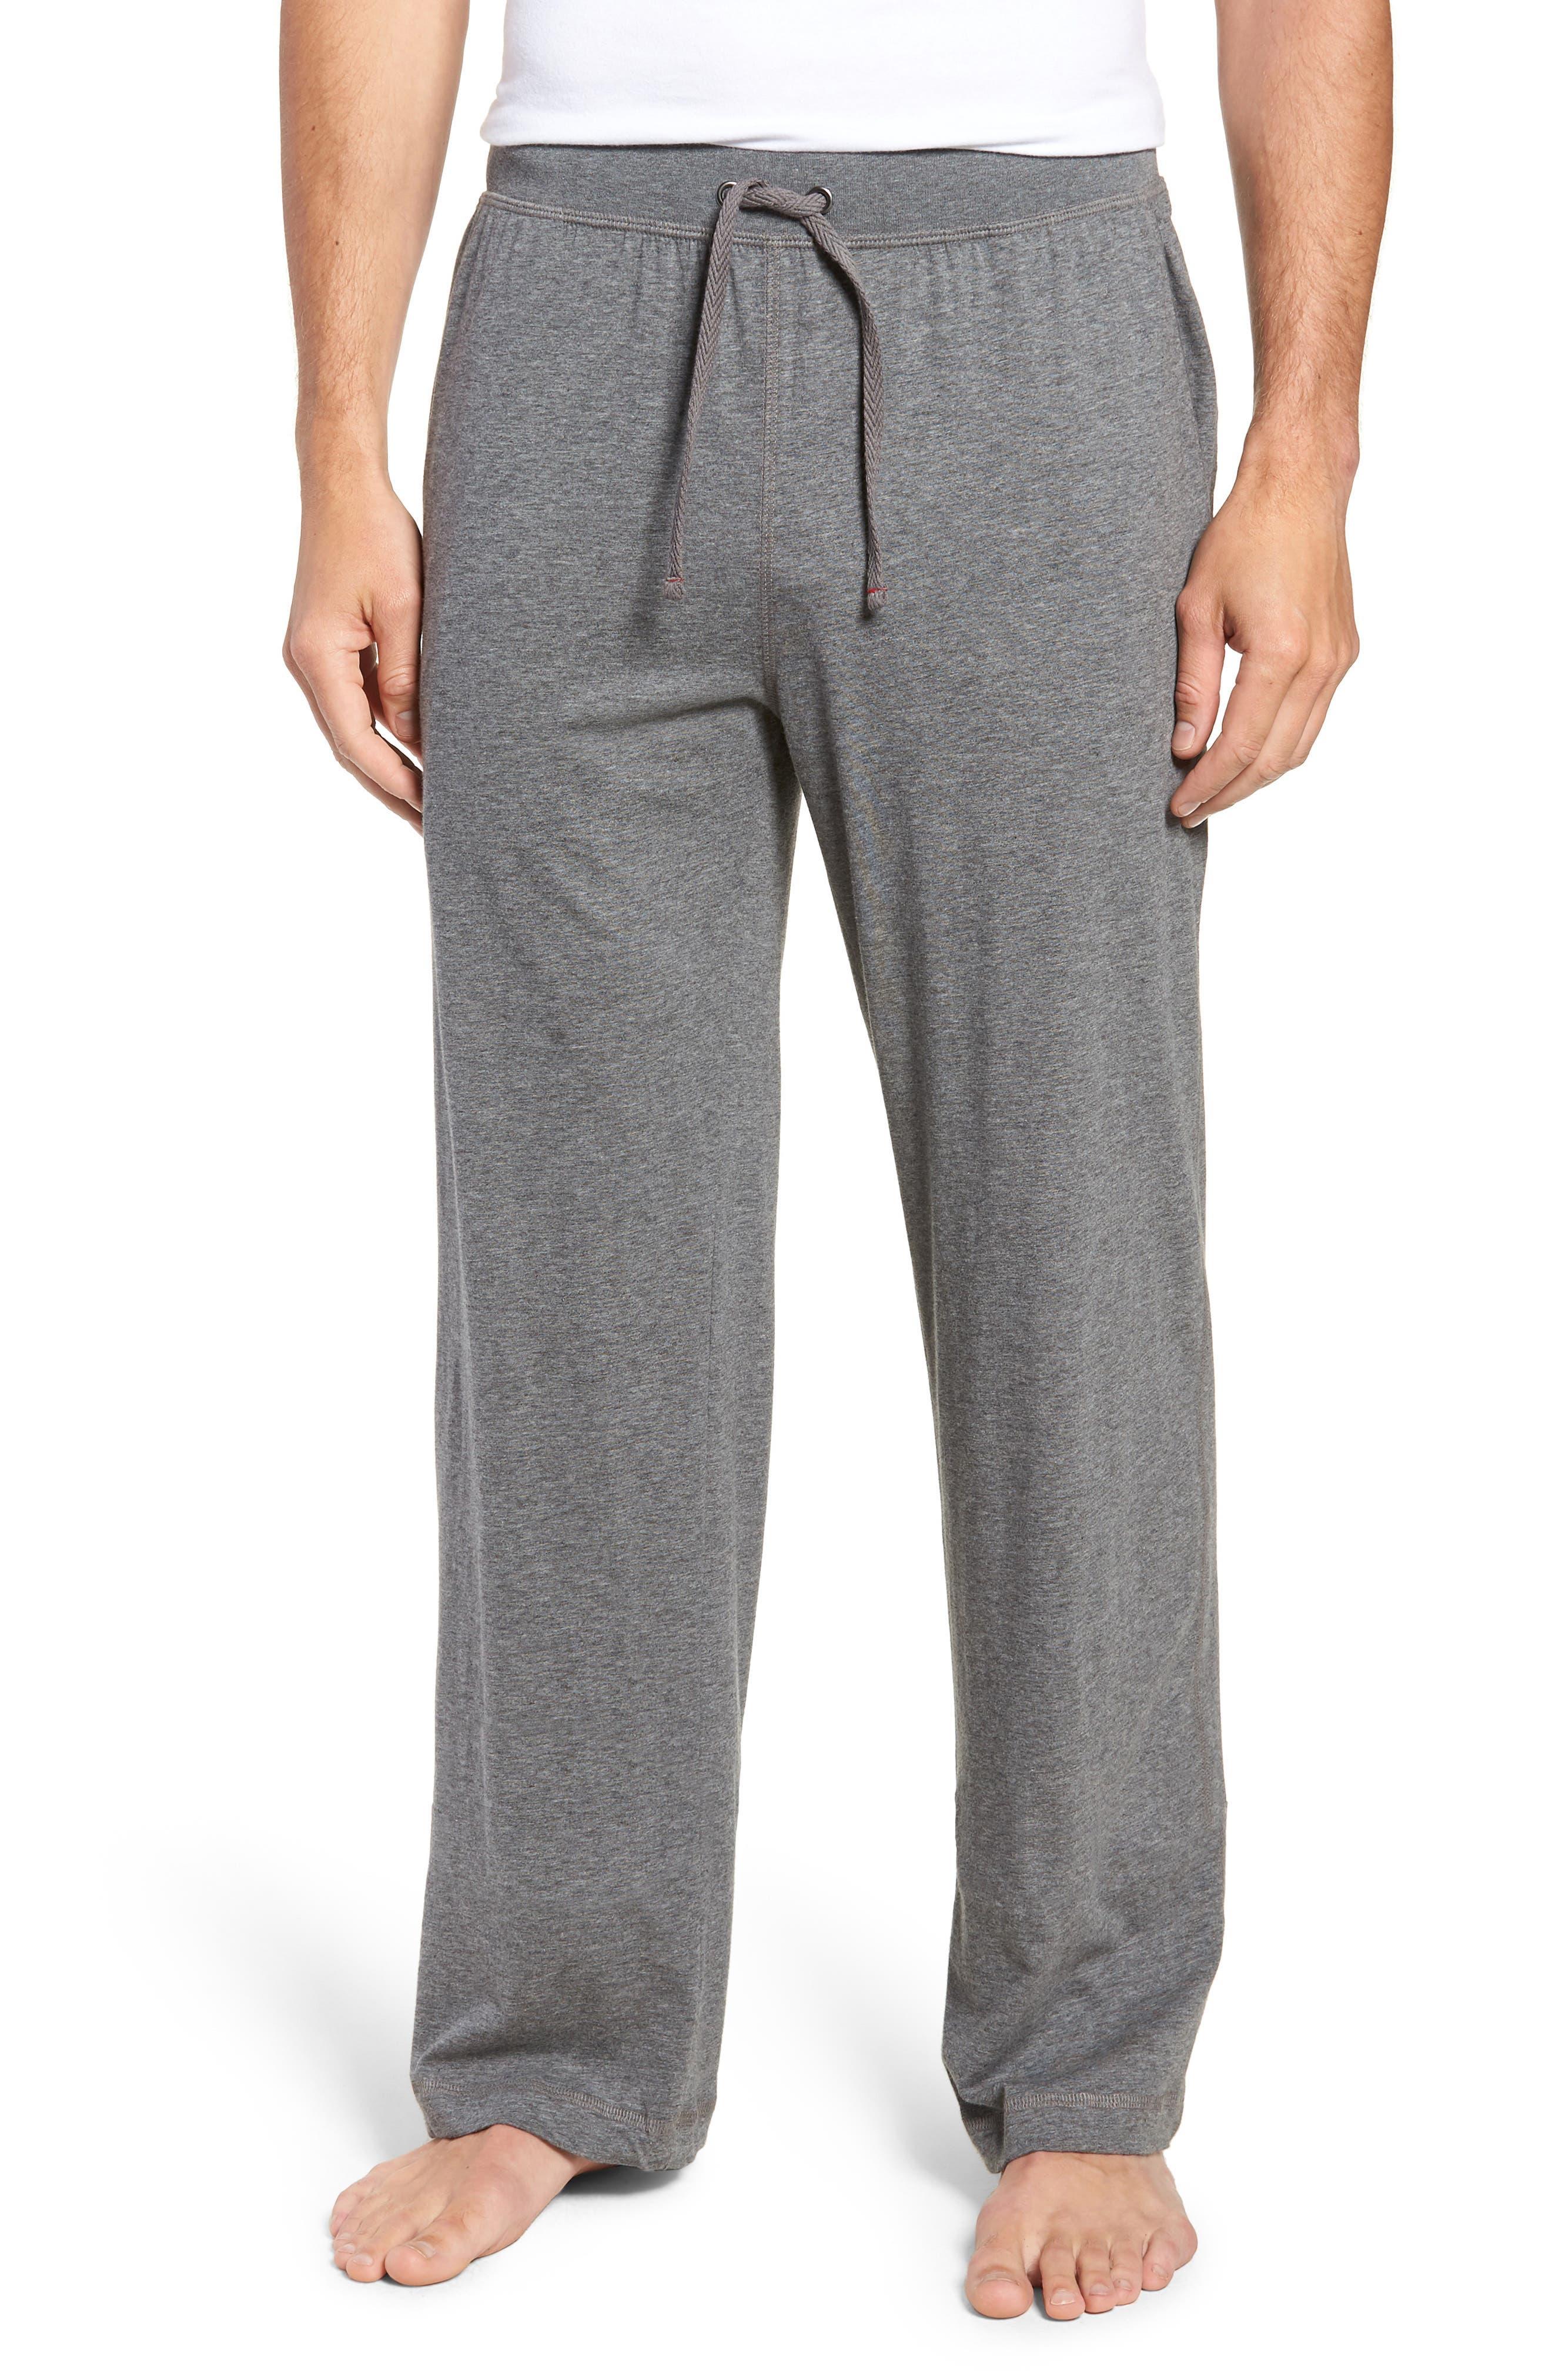 Peruvian Pima Lightweight Cotton Lounge Pants,                             Main thumbnail 1, color,                             CHARCOAL HEATHER